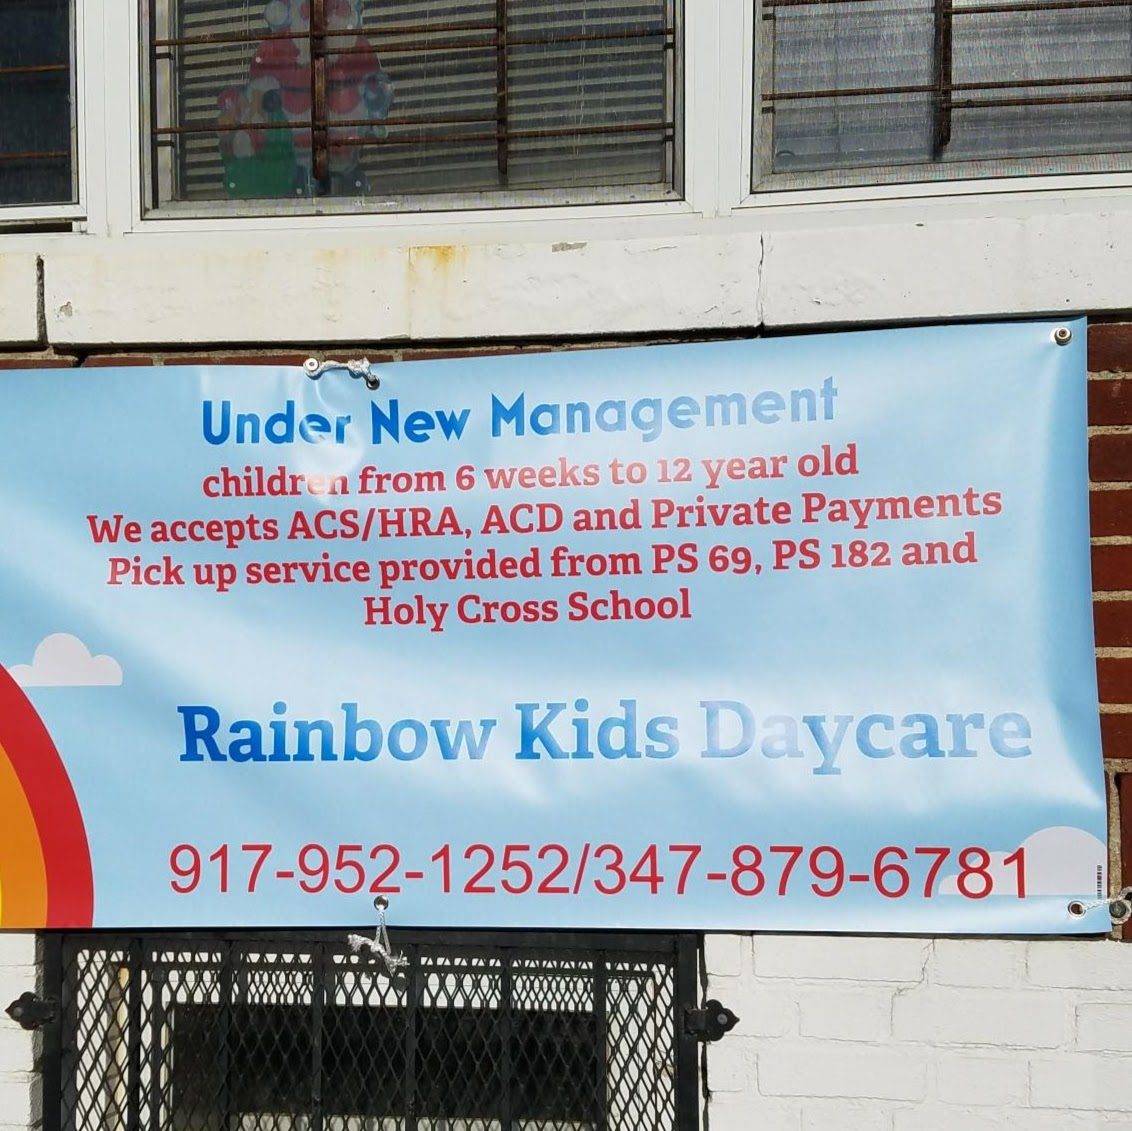 Rainbow Kids Daycare